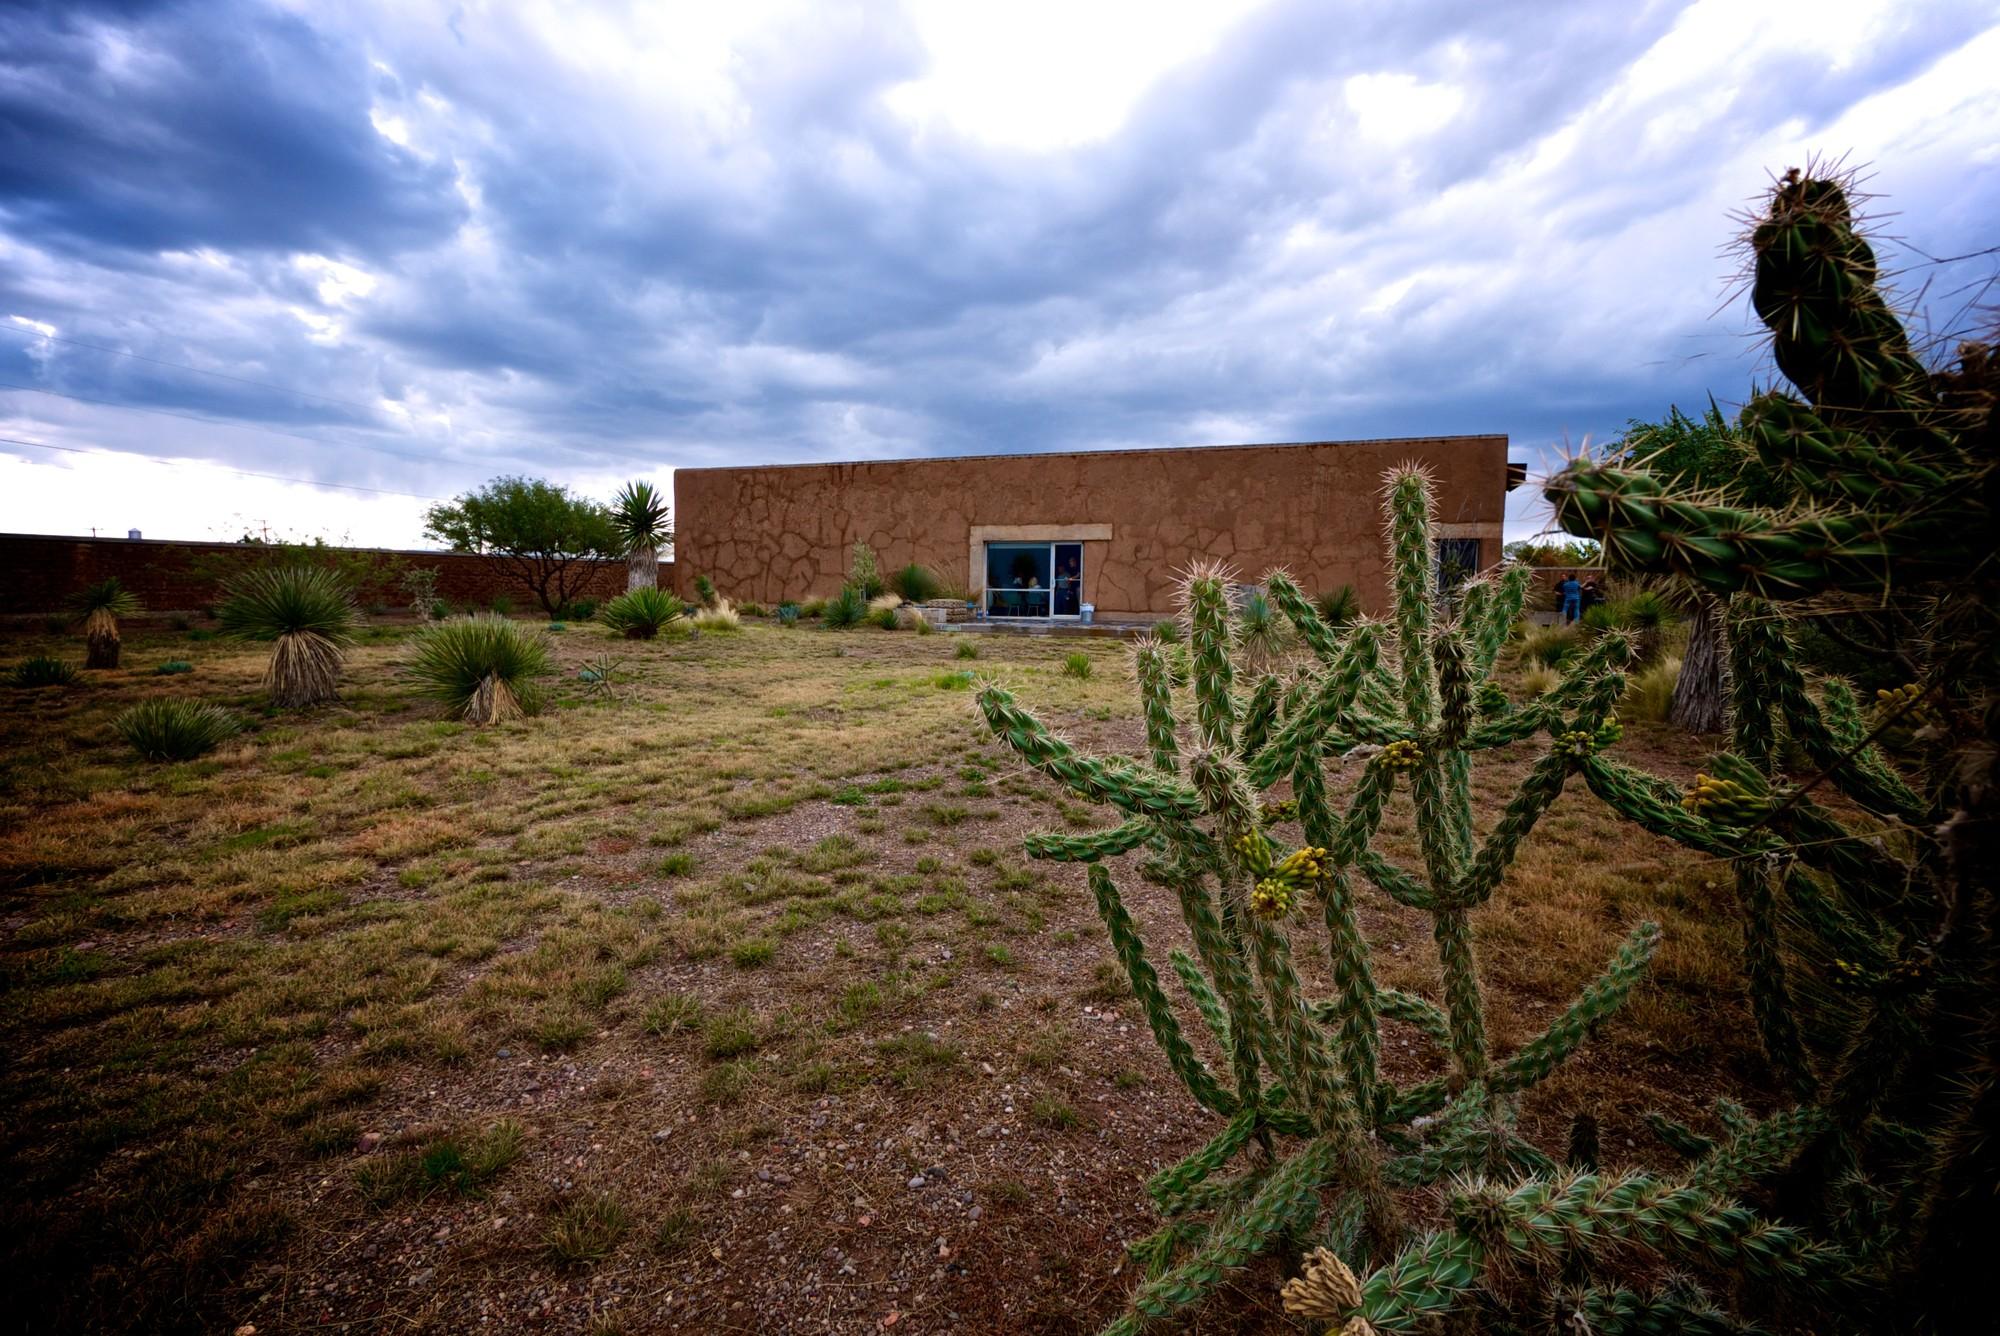 Mud Box (Terry Mowers Residence) / Rael San Fratello | Photo: Rael San Fratello